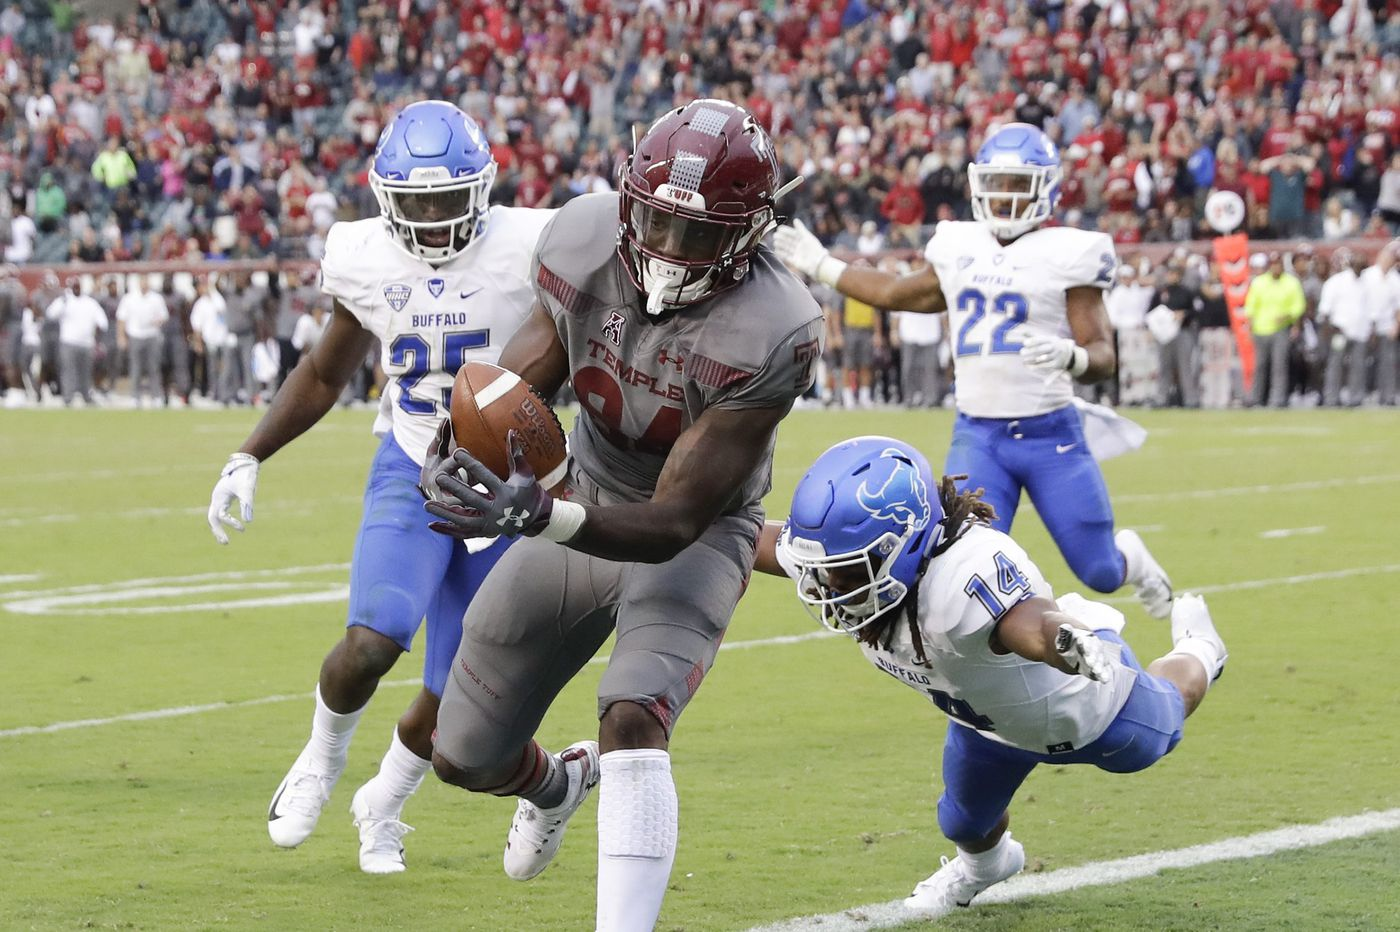 Temple offensive line seeks improvement